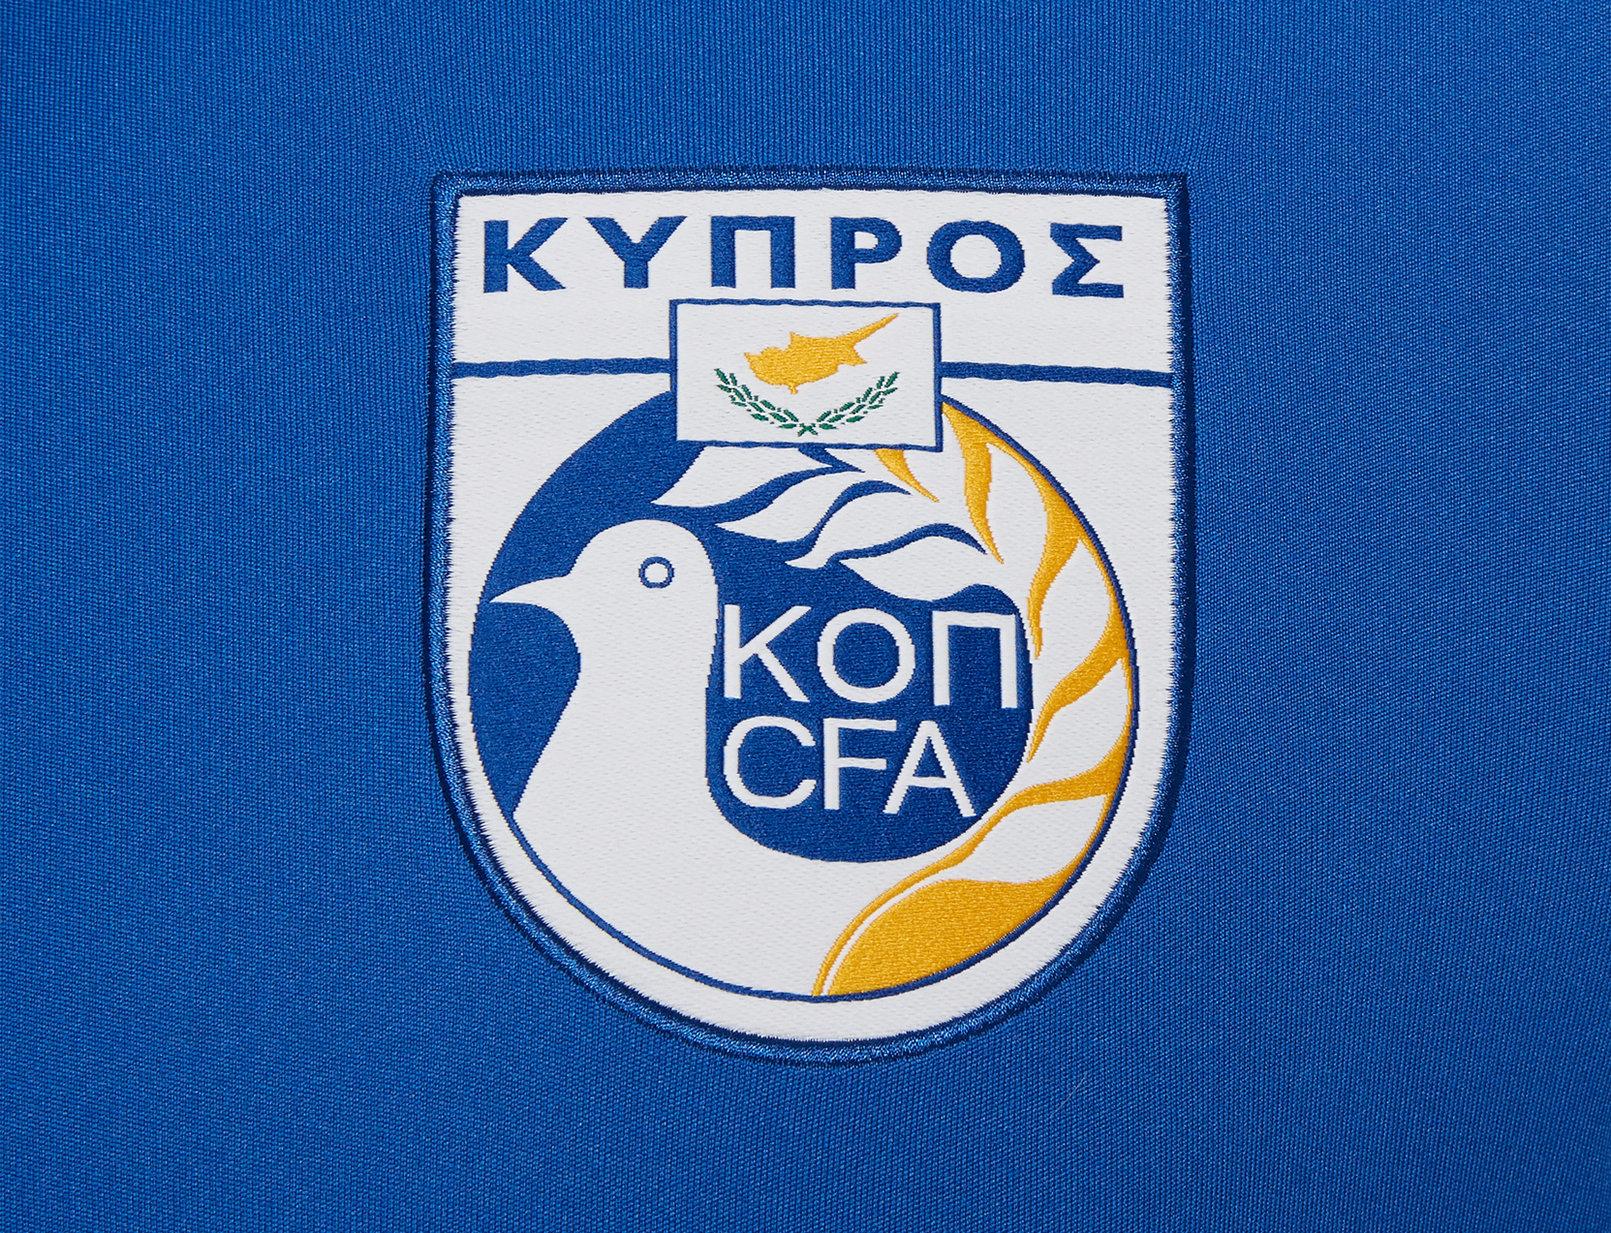 Camiseta titular de Chipre 2018/19 | Imagen Macron